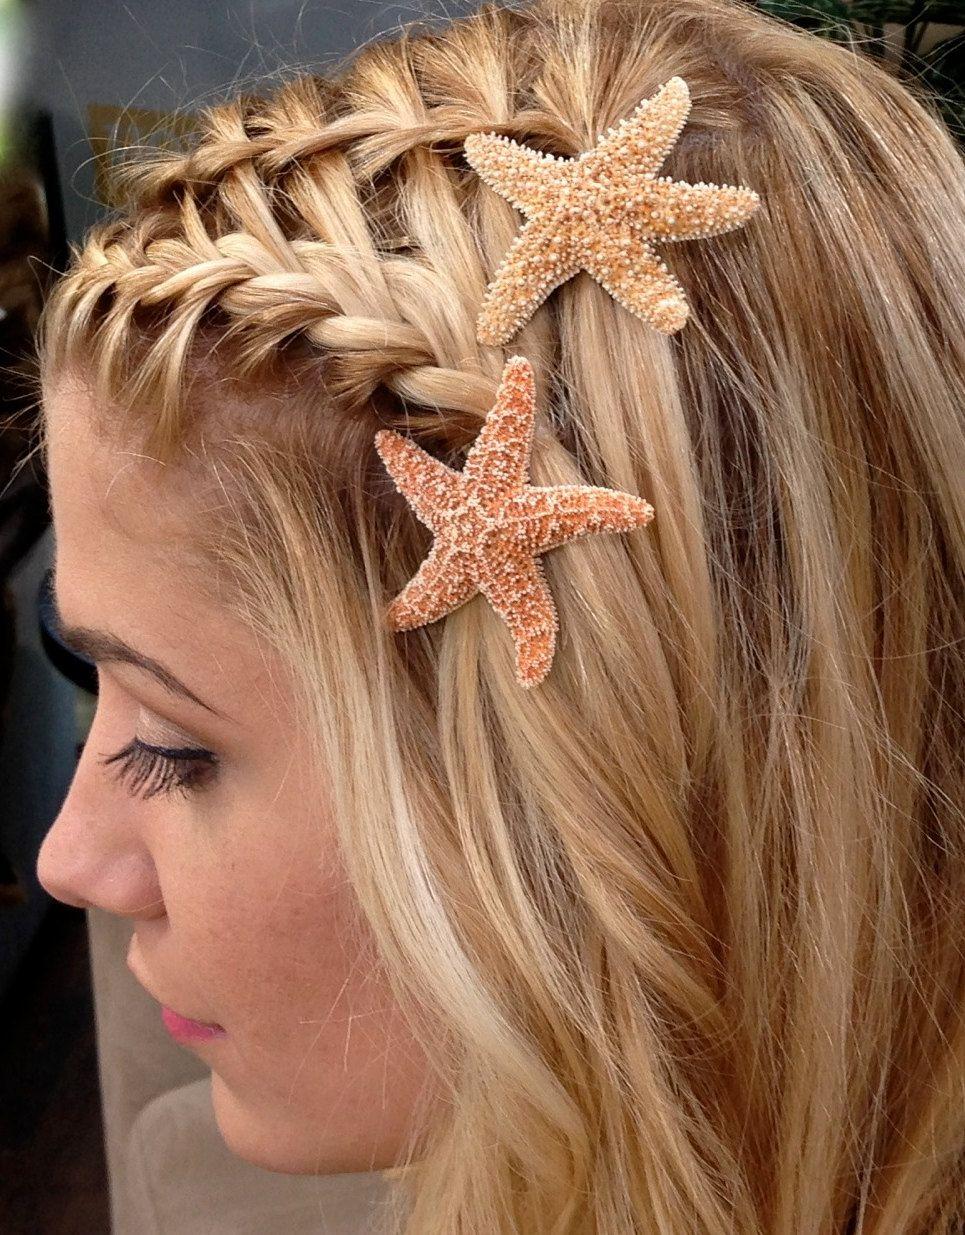 Starfish Hair Pins Beach Accessories By Seashellcollection 15 00